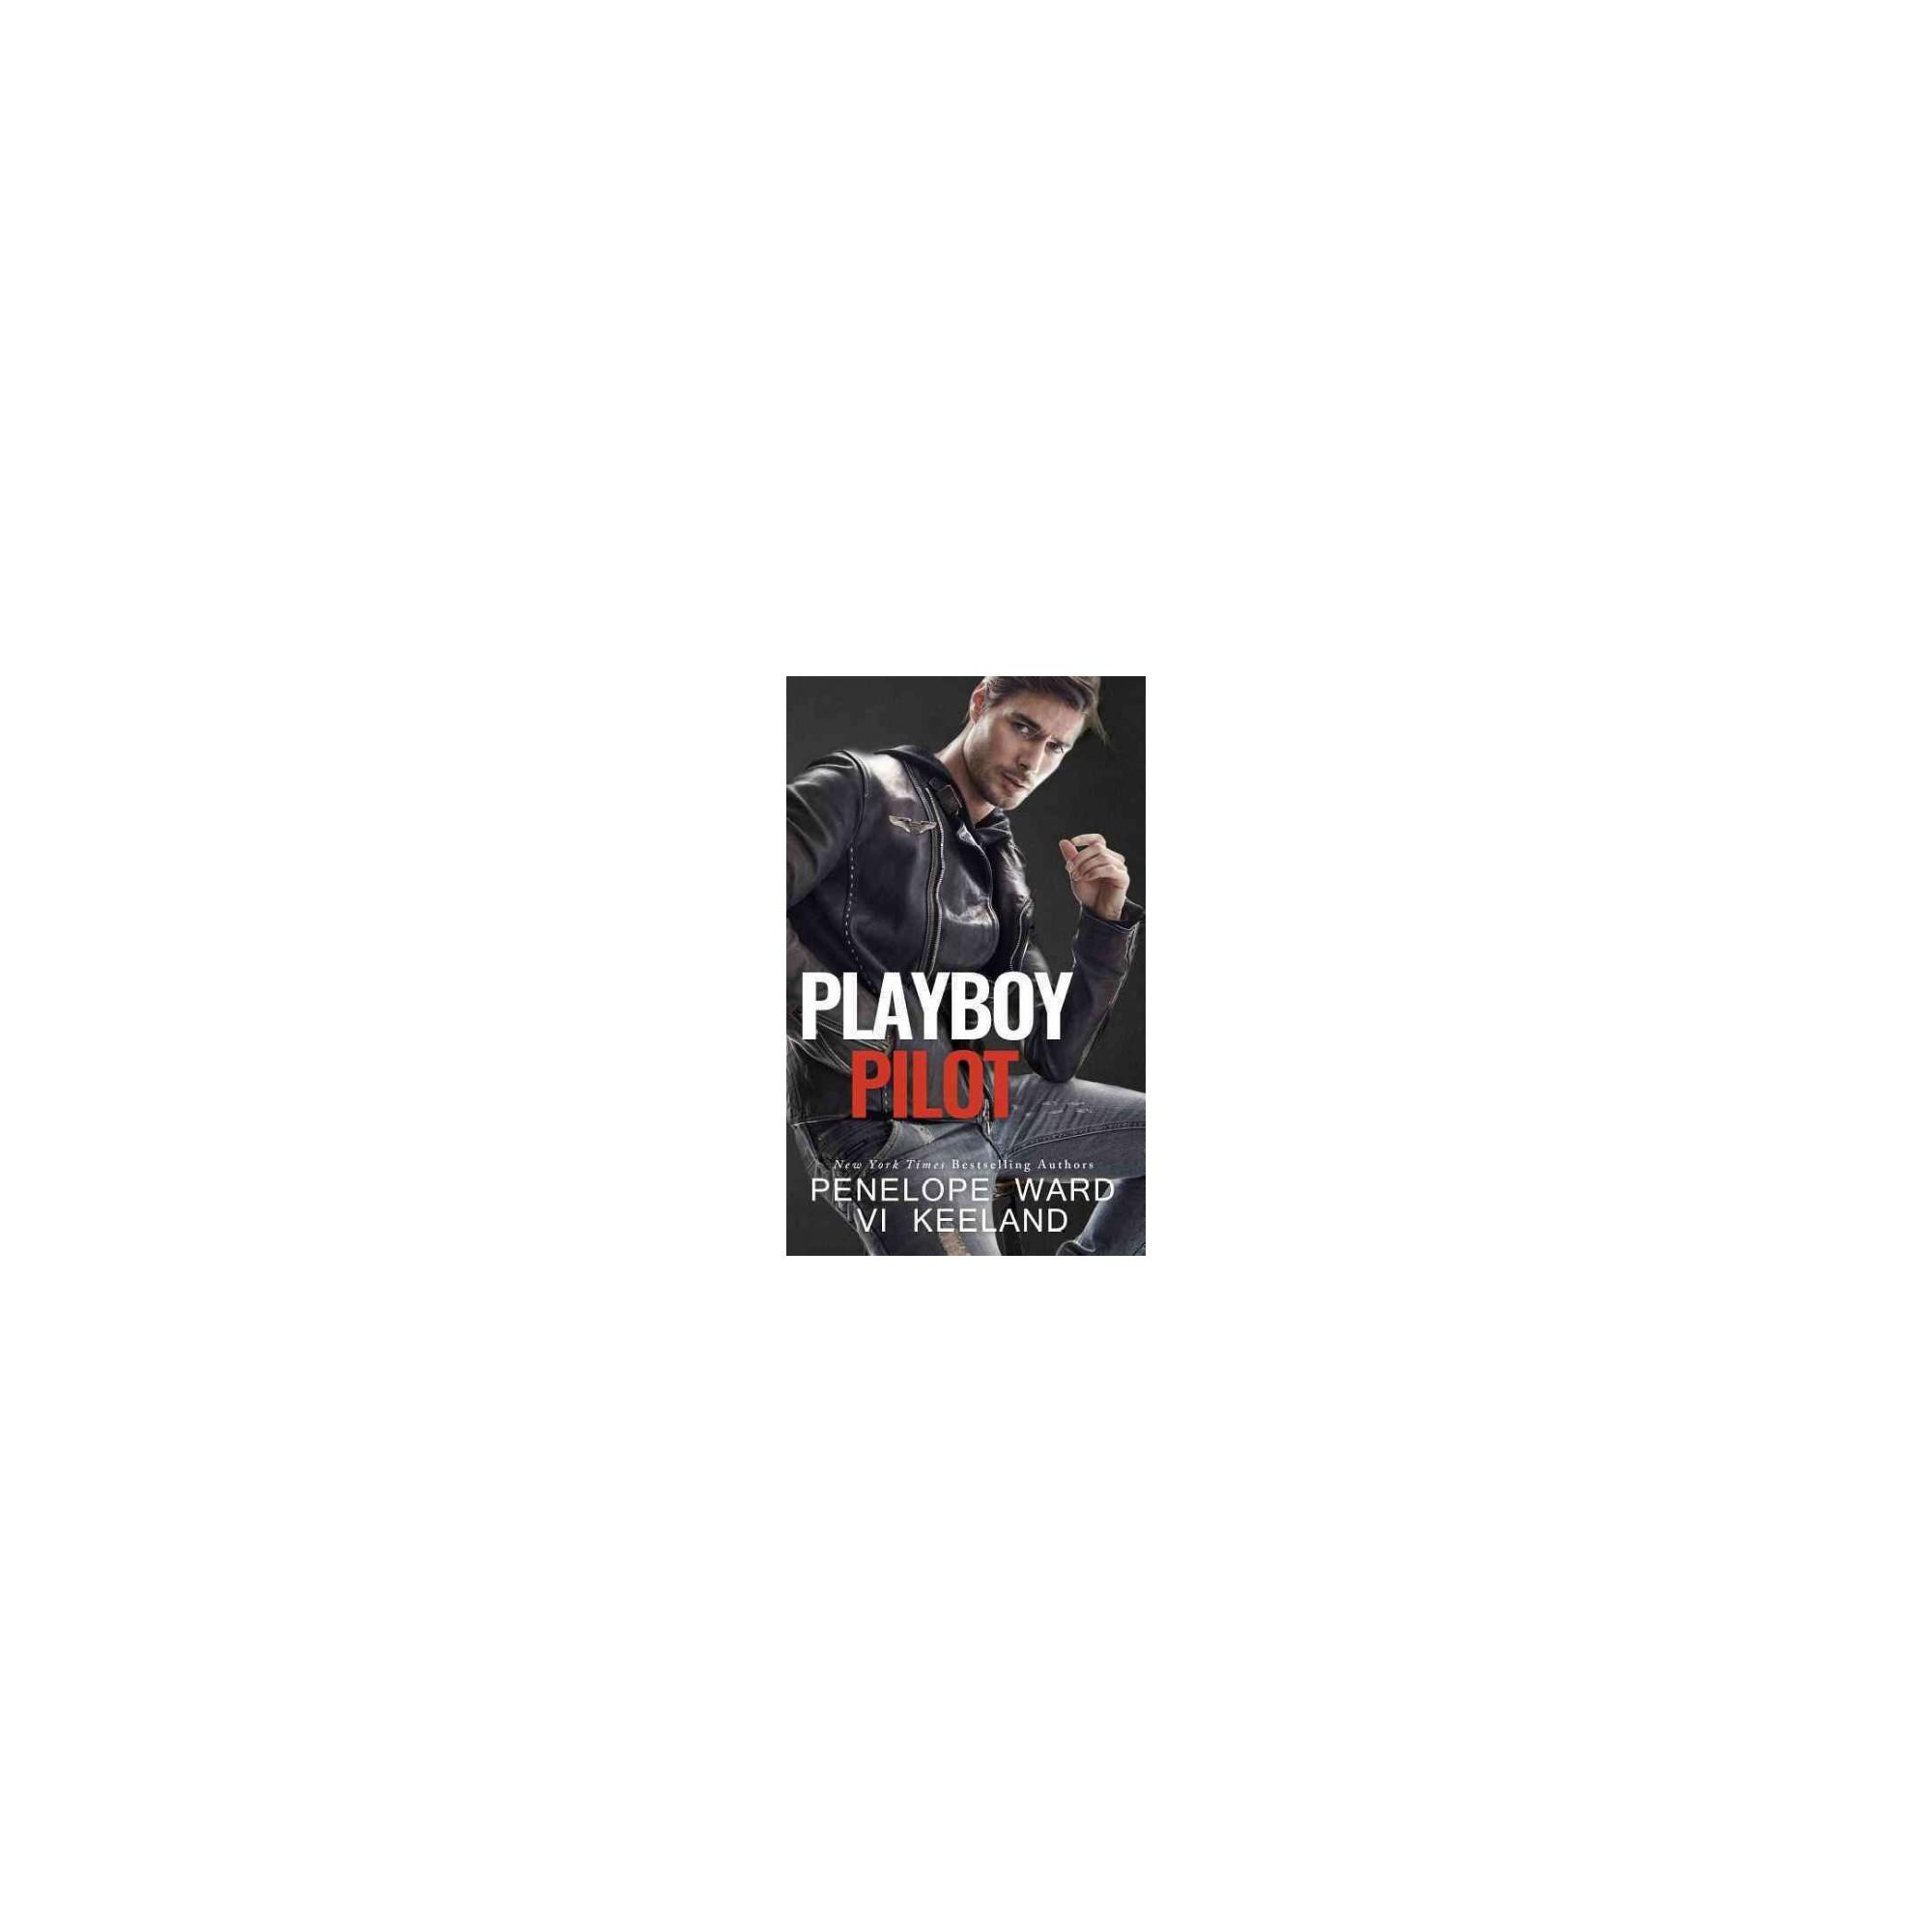 Playboy Pilot (Paperback) (Penelope Ward) | Pilot and Products